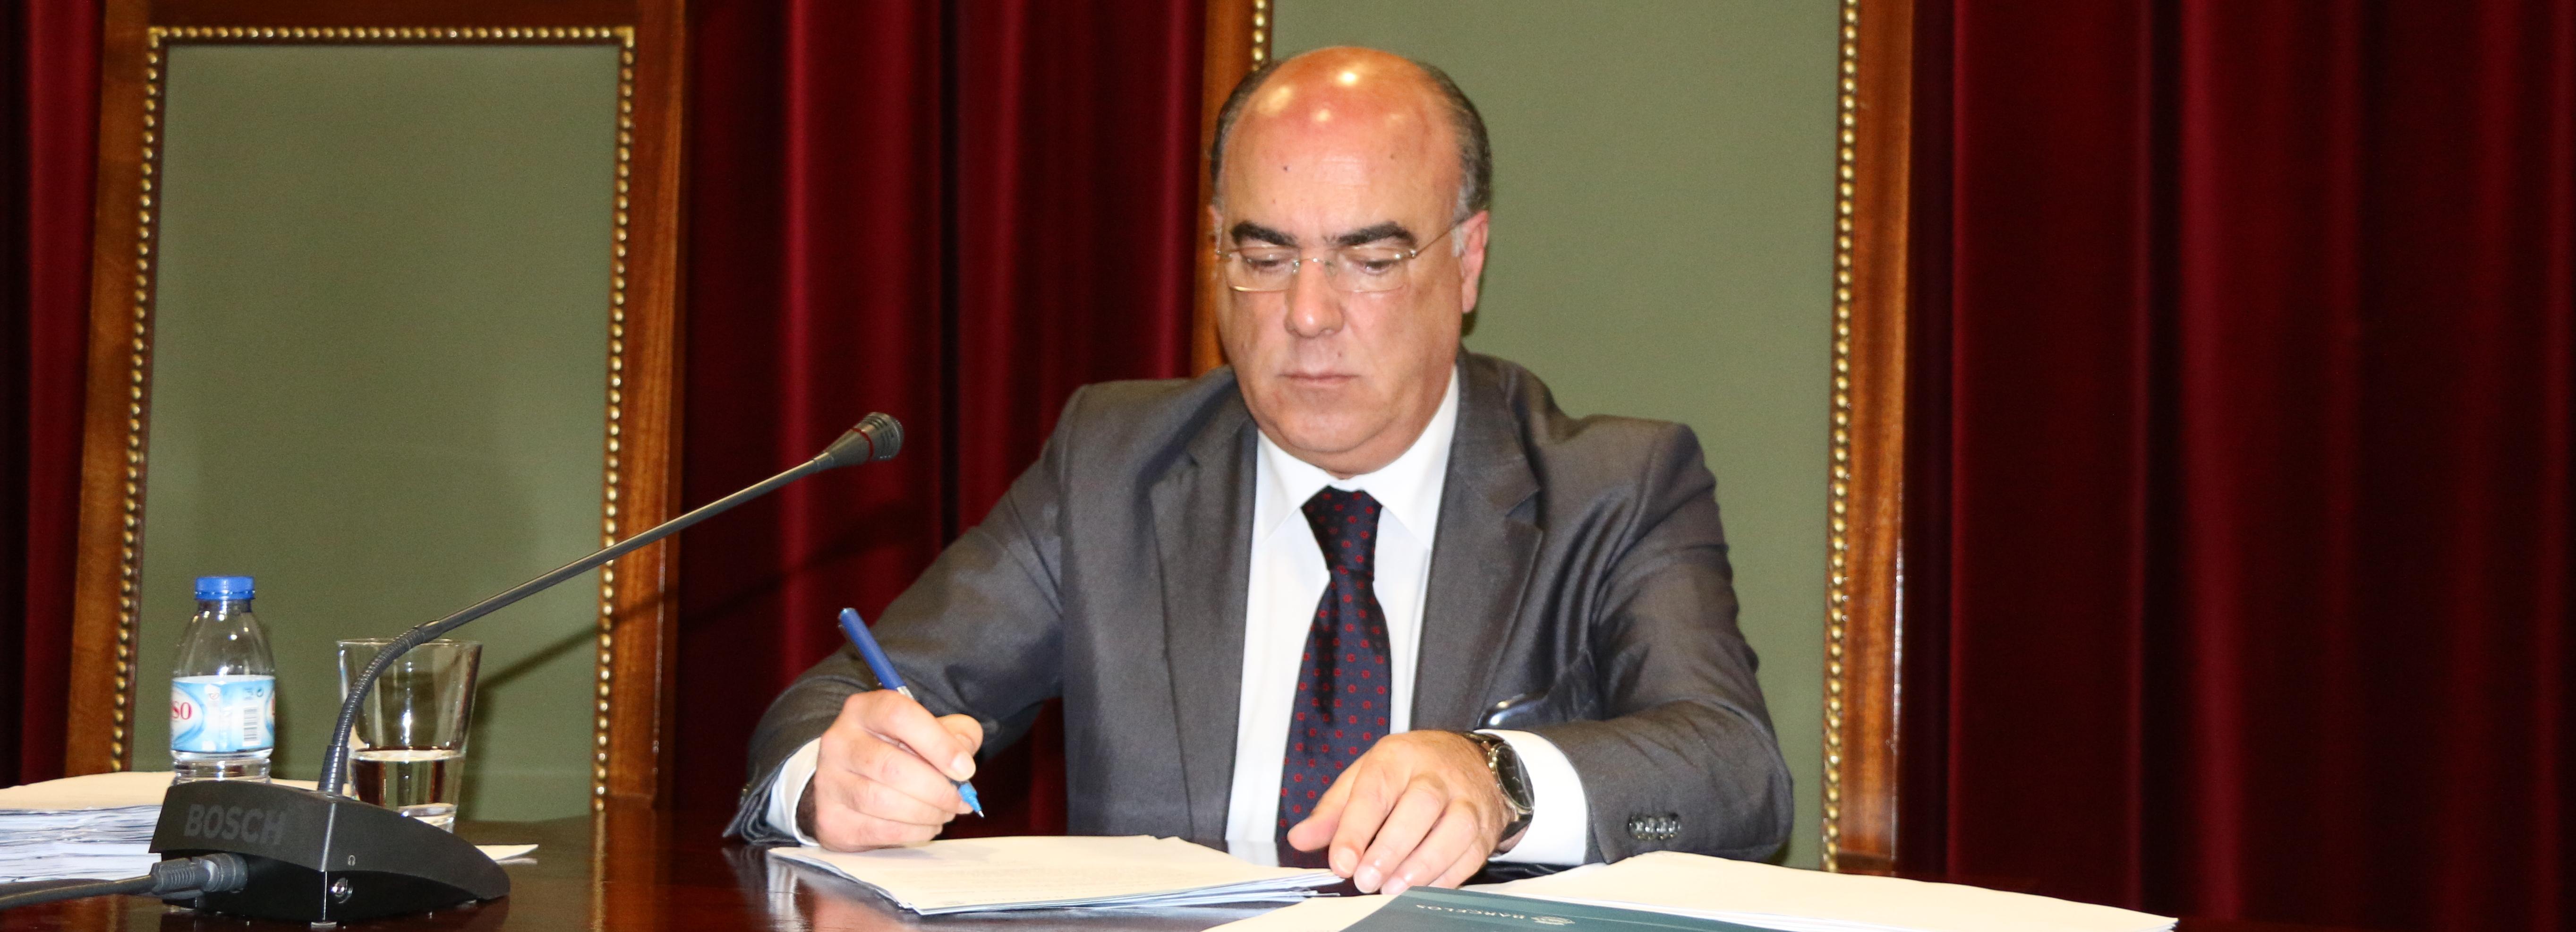 Câmara Municipal de Barcelos aprova apoios a nível social, cultural e desportivo